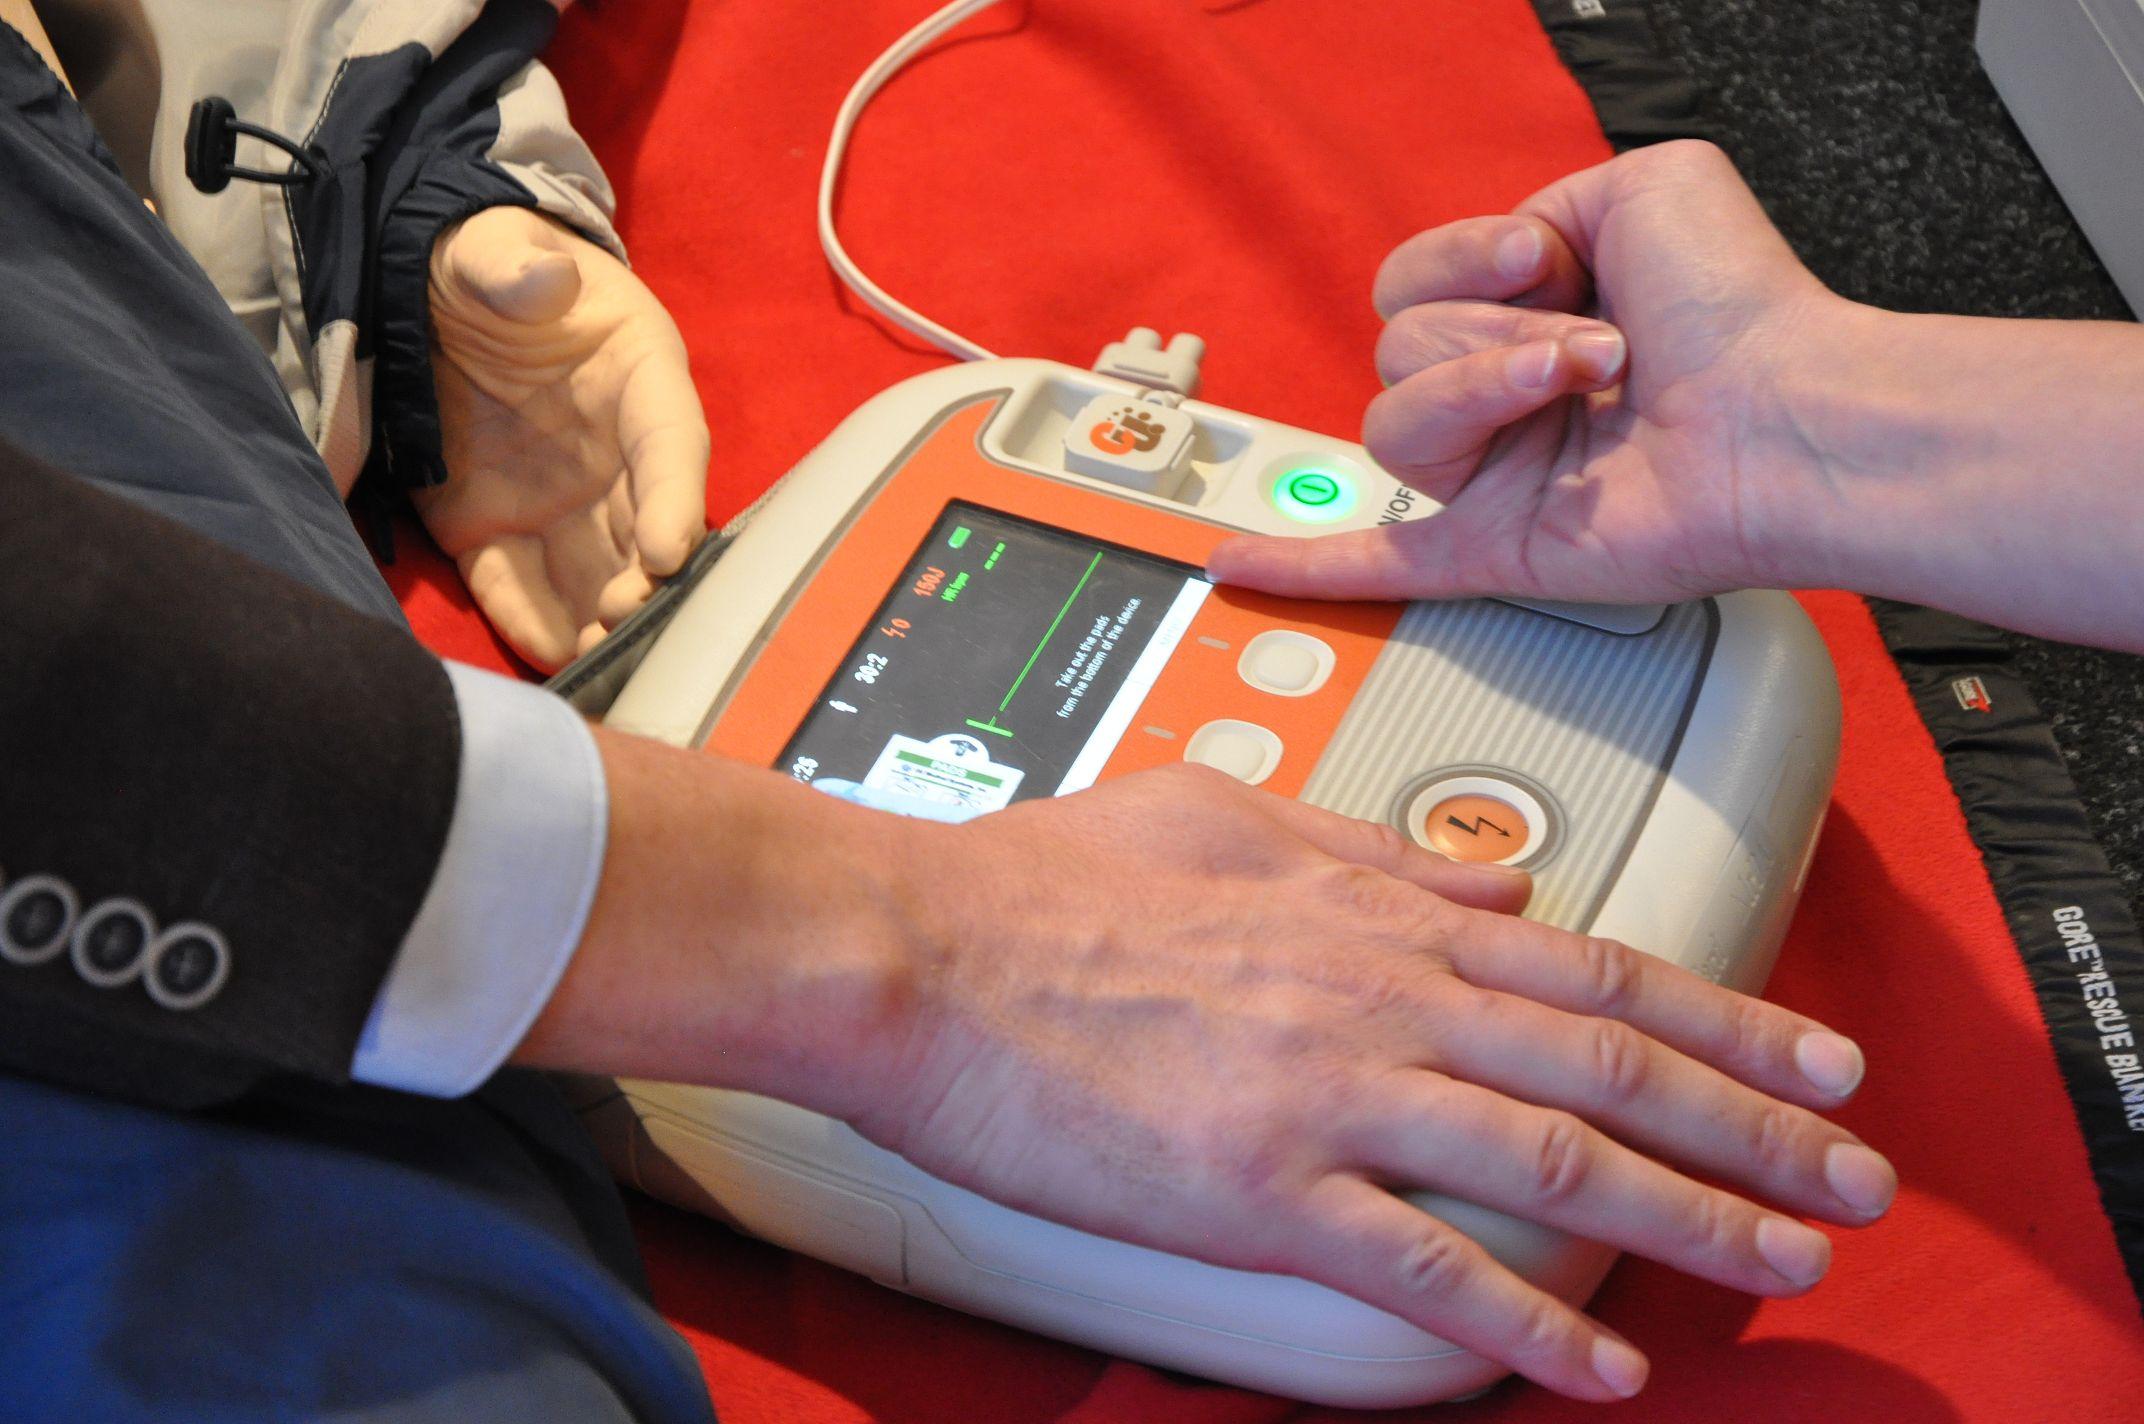 Art of color worrstadt - 09 May 2017 Reetec Is Testing State Of The Art Generation Defibrillators On Several Onshore Sites Bremen Germany Renewablepress Reetec